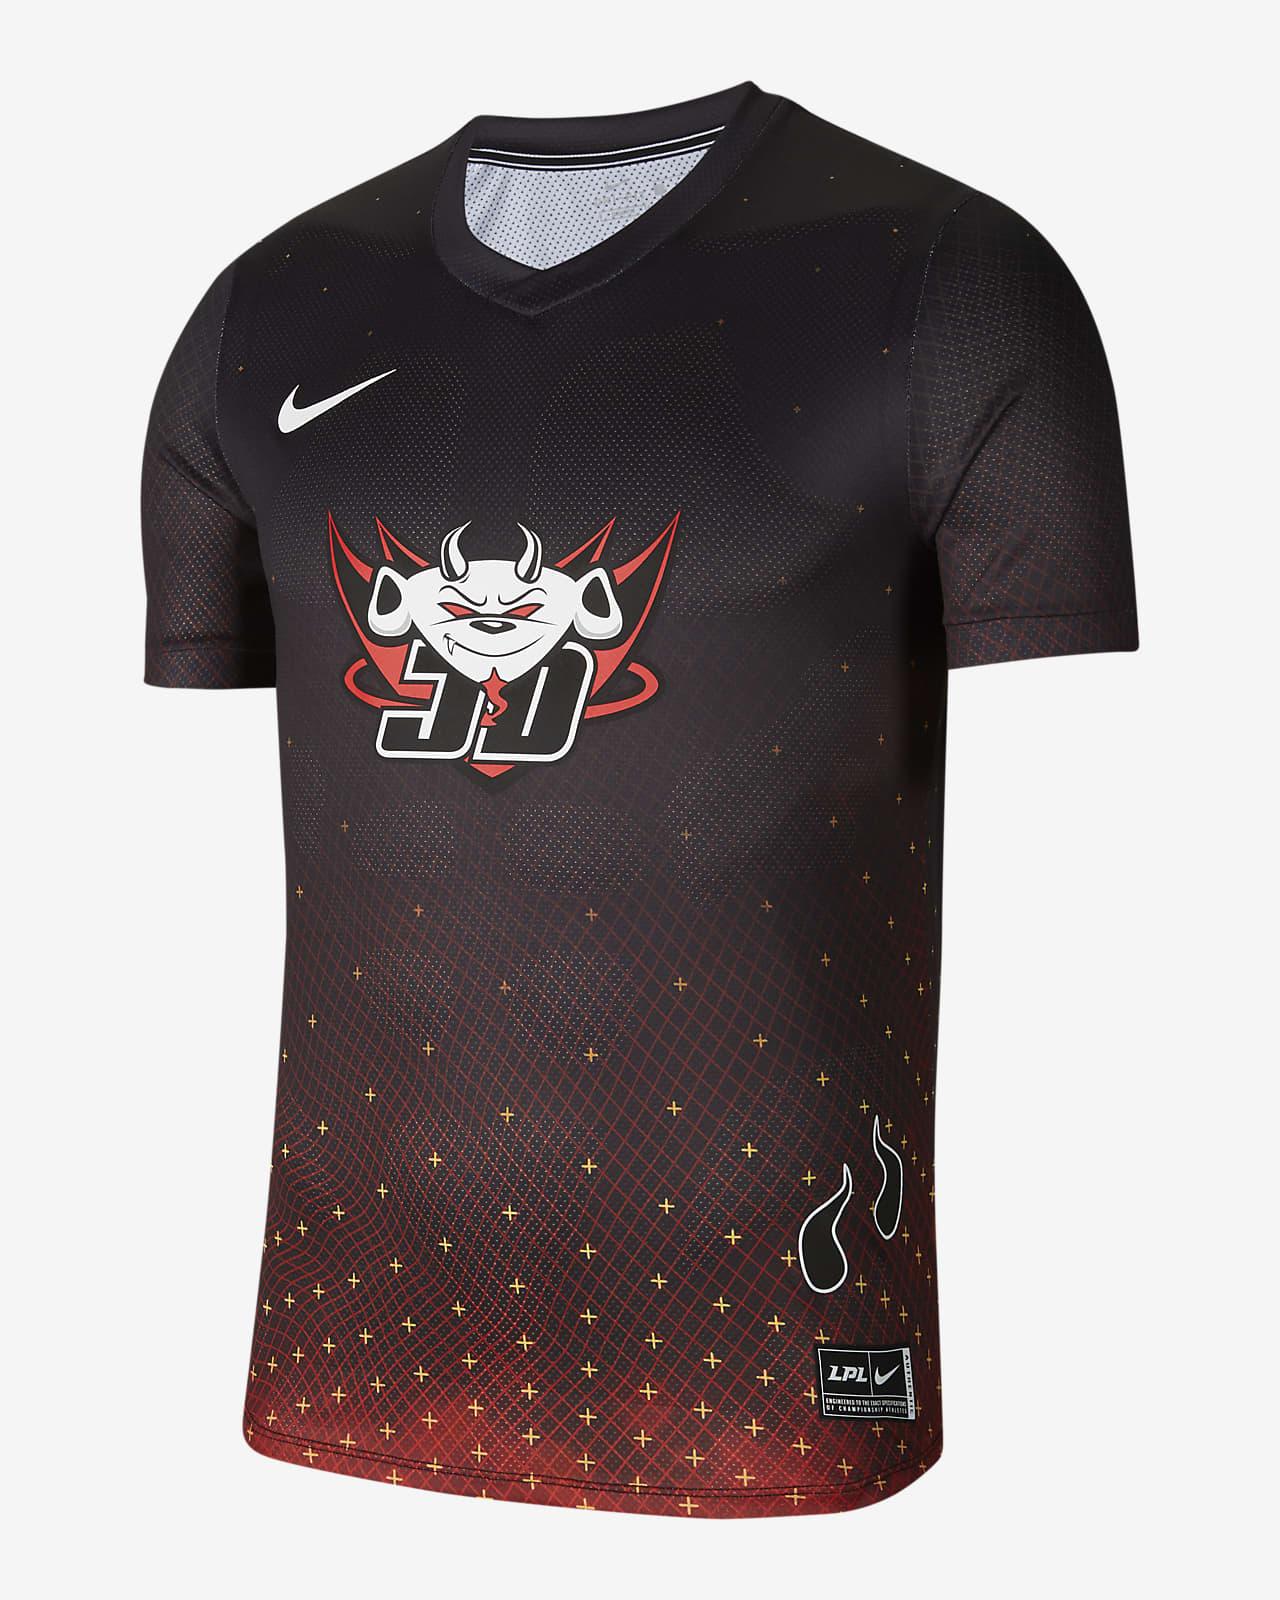 Nike x LPL JDG 男子比赛服